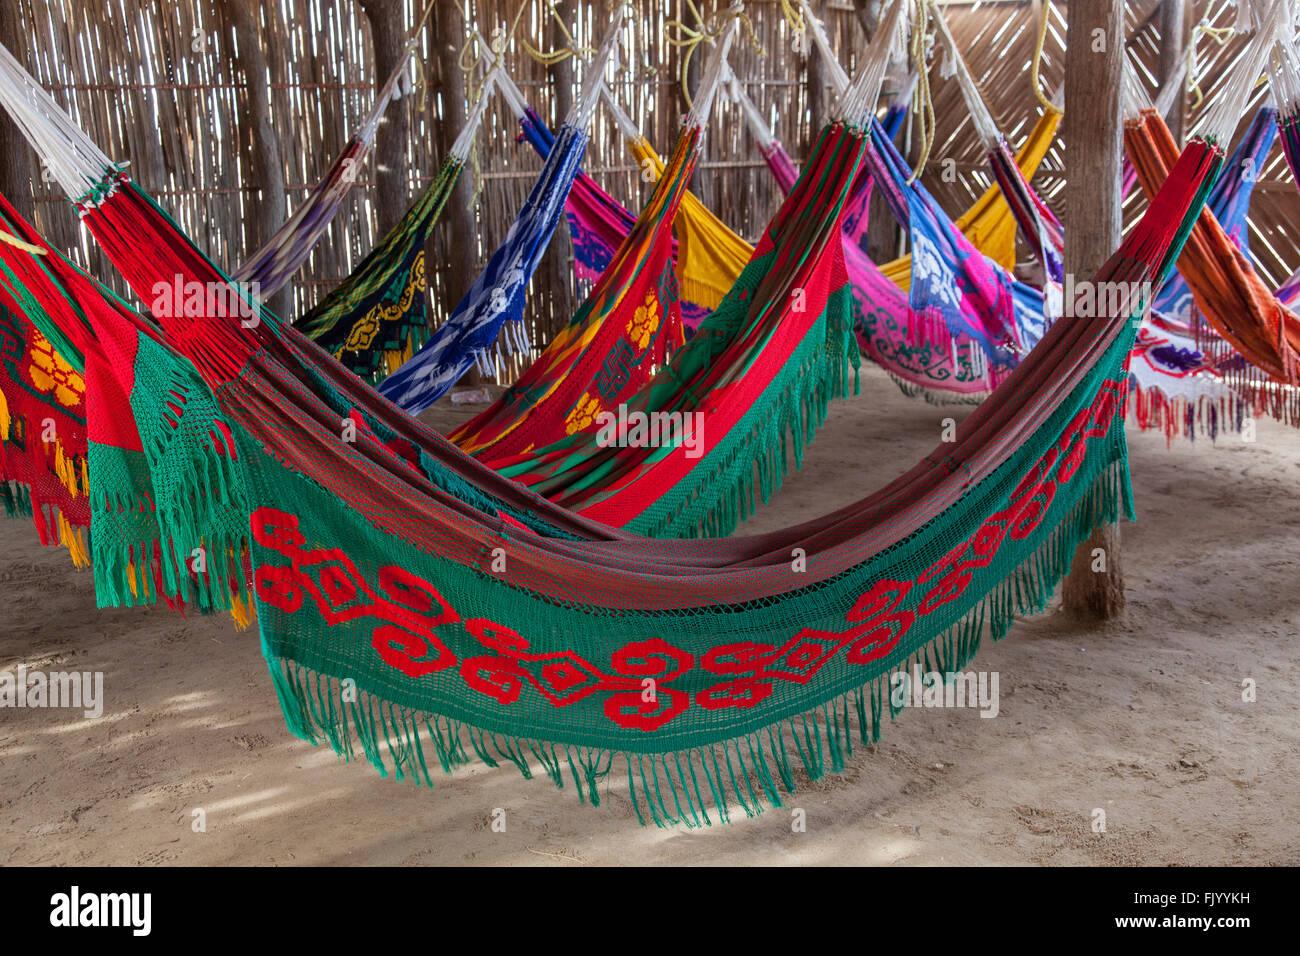 Basic hammocks accomodation for tourist in Punta Gallinos, Colombia - Stock Image